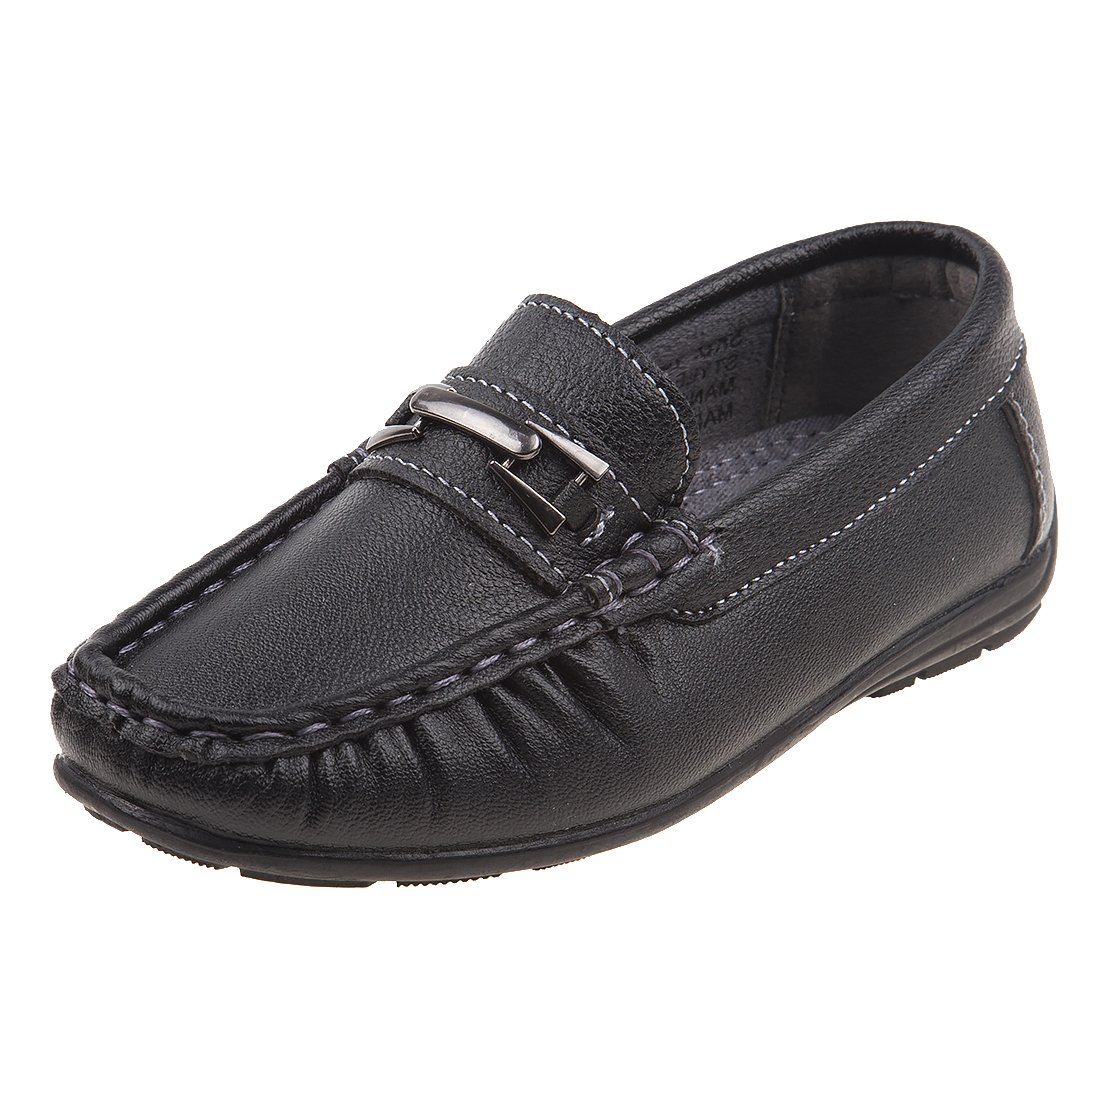 Josmo Boys Casual Driving Slip-on Shoe (Toddler, Little Kid, Big Kid), Black, Size 5 US Big Kid